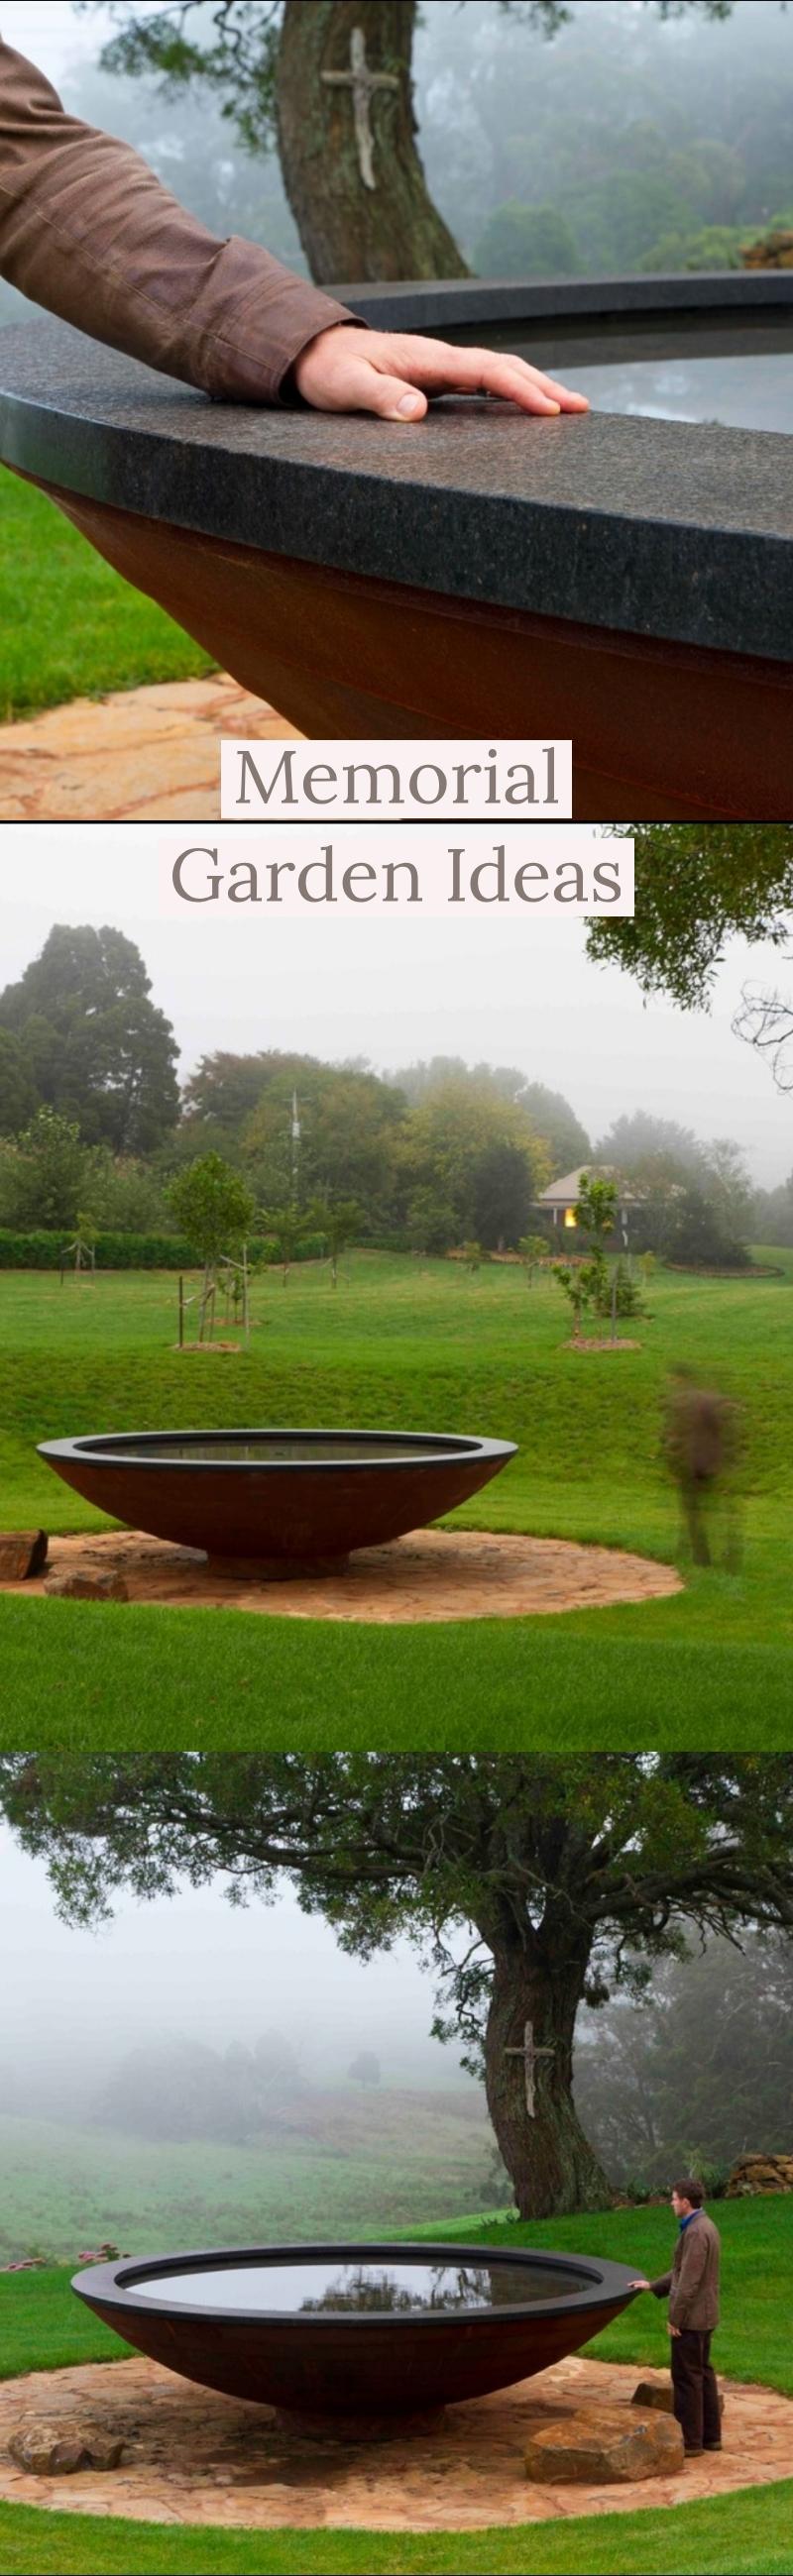 21+ Lovely Memorial Garden Ideas 2019 (Designs, Elements ...